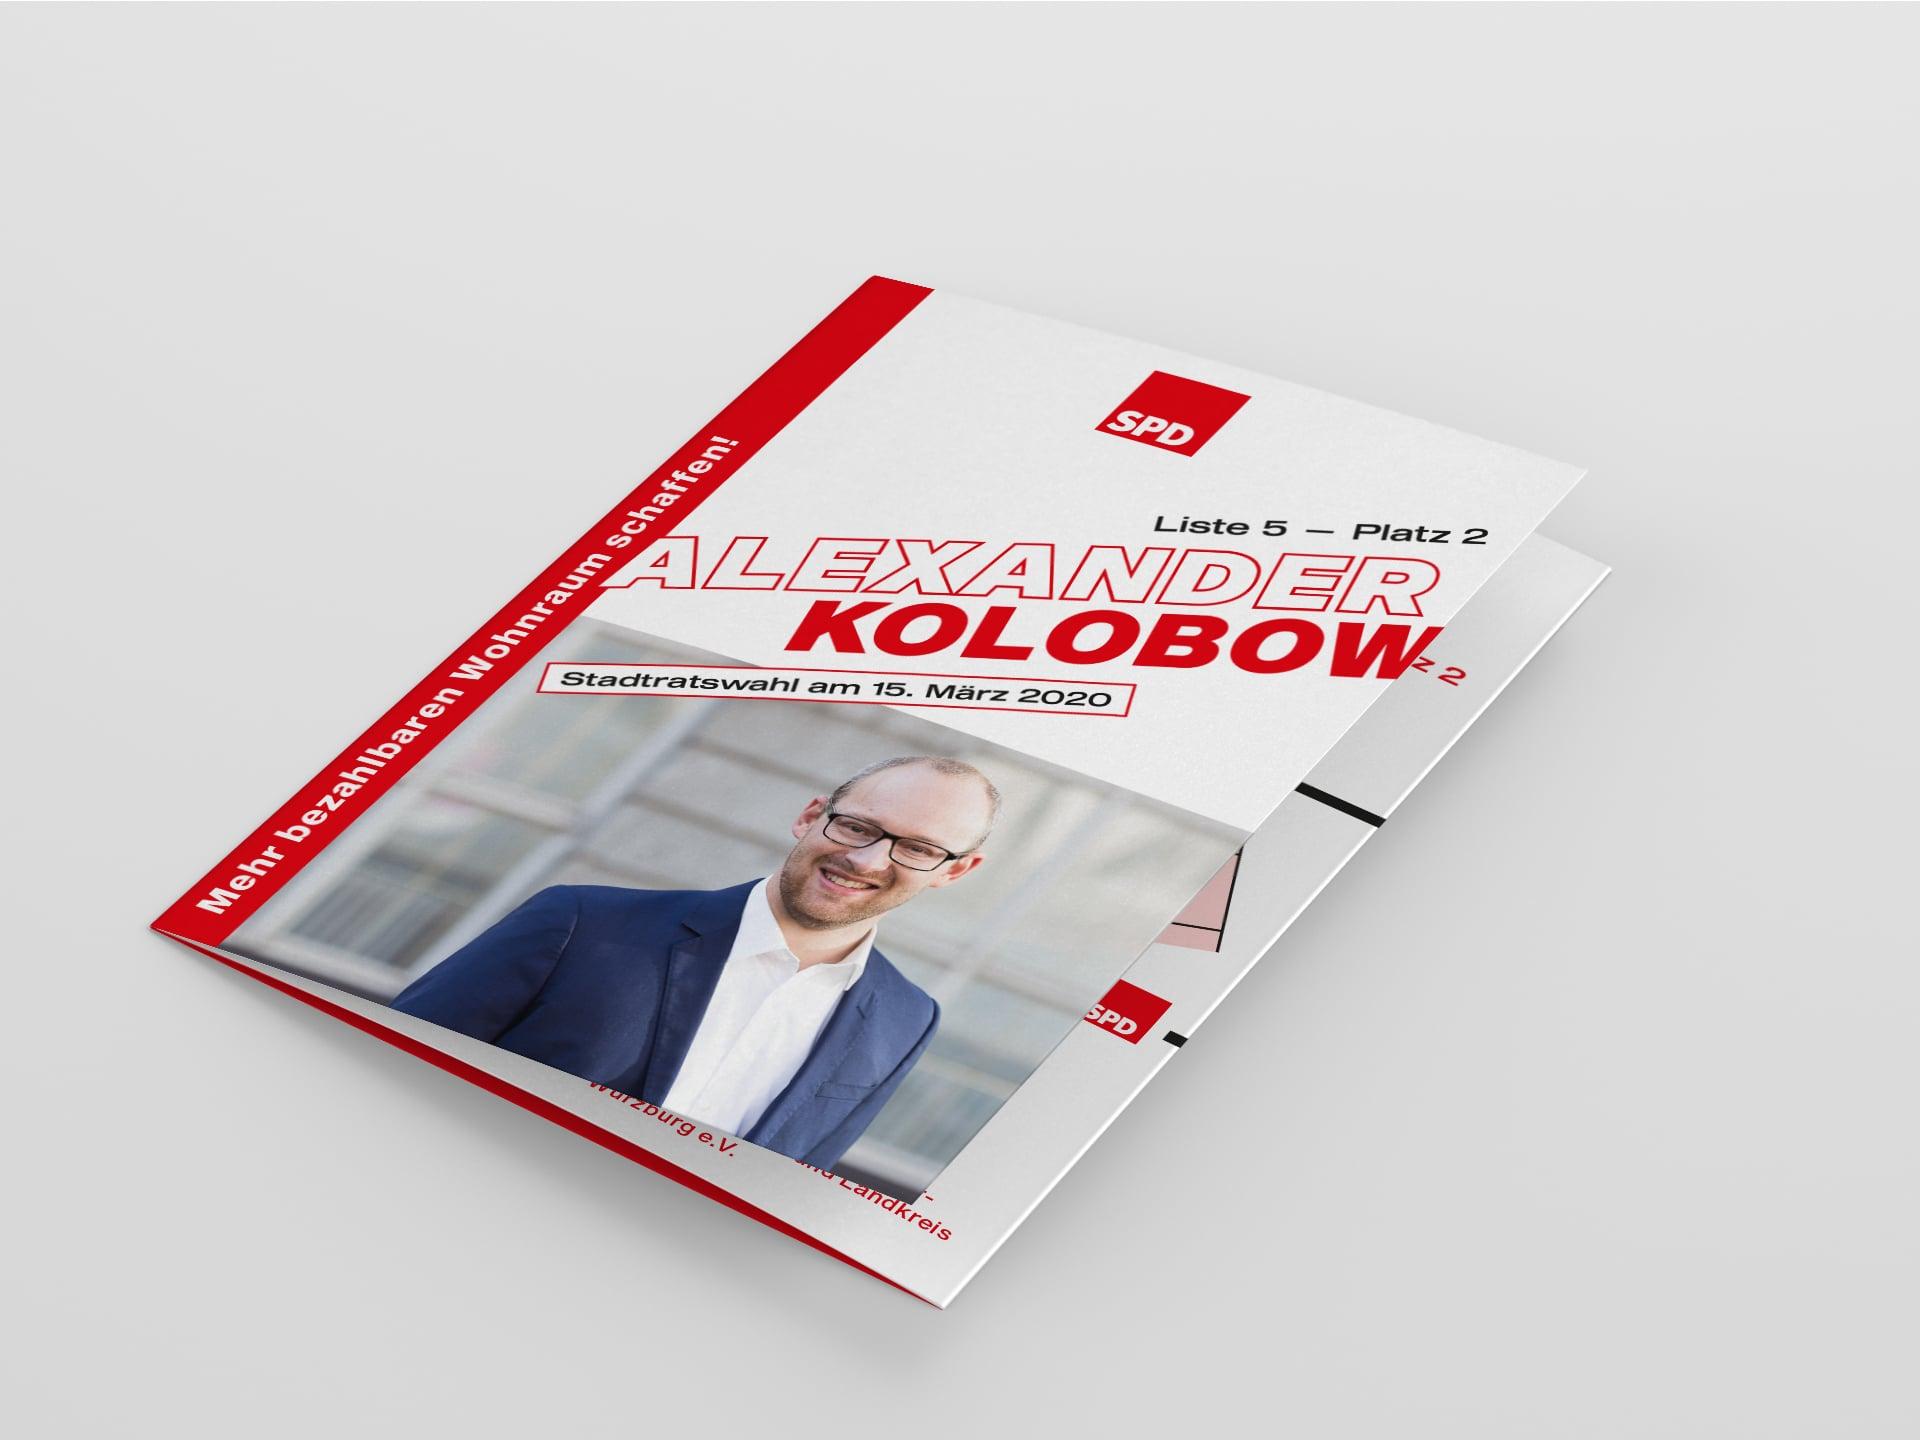 SPD Würzburg Kommunalwahl-Kampagne Design Kandidaten-Flyer Kolbow